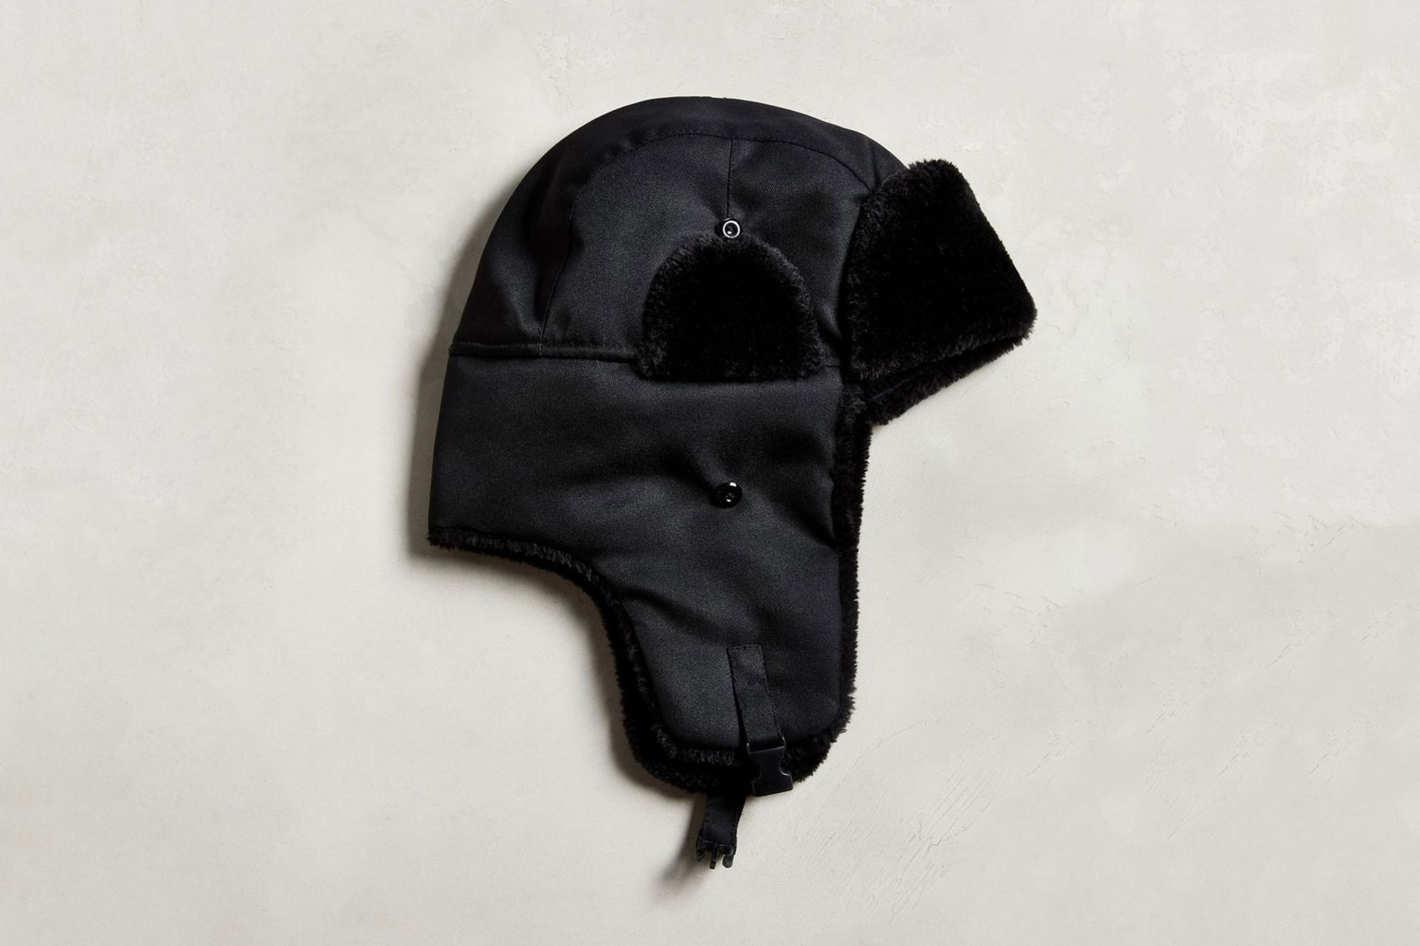 834e75c13a6 That s a Good Look  Big Trapper Hat by Prada